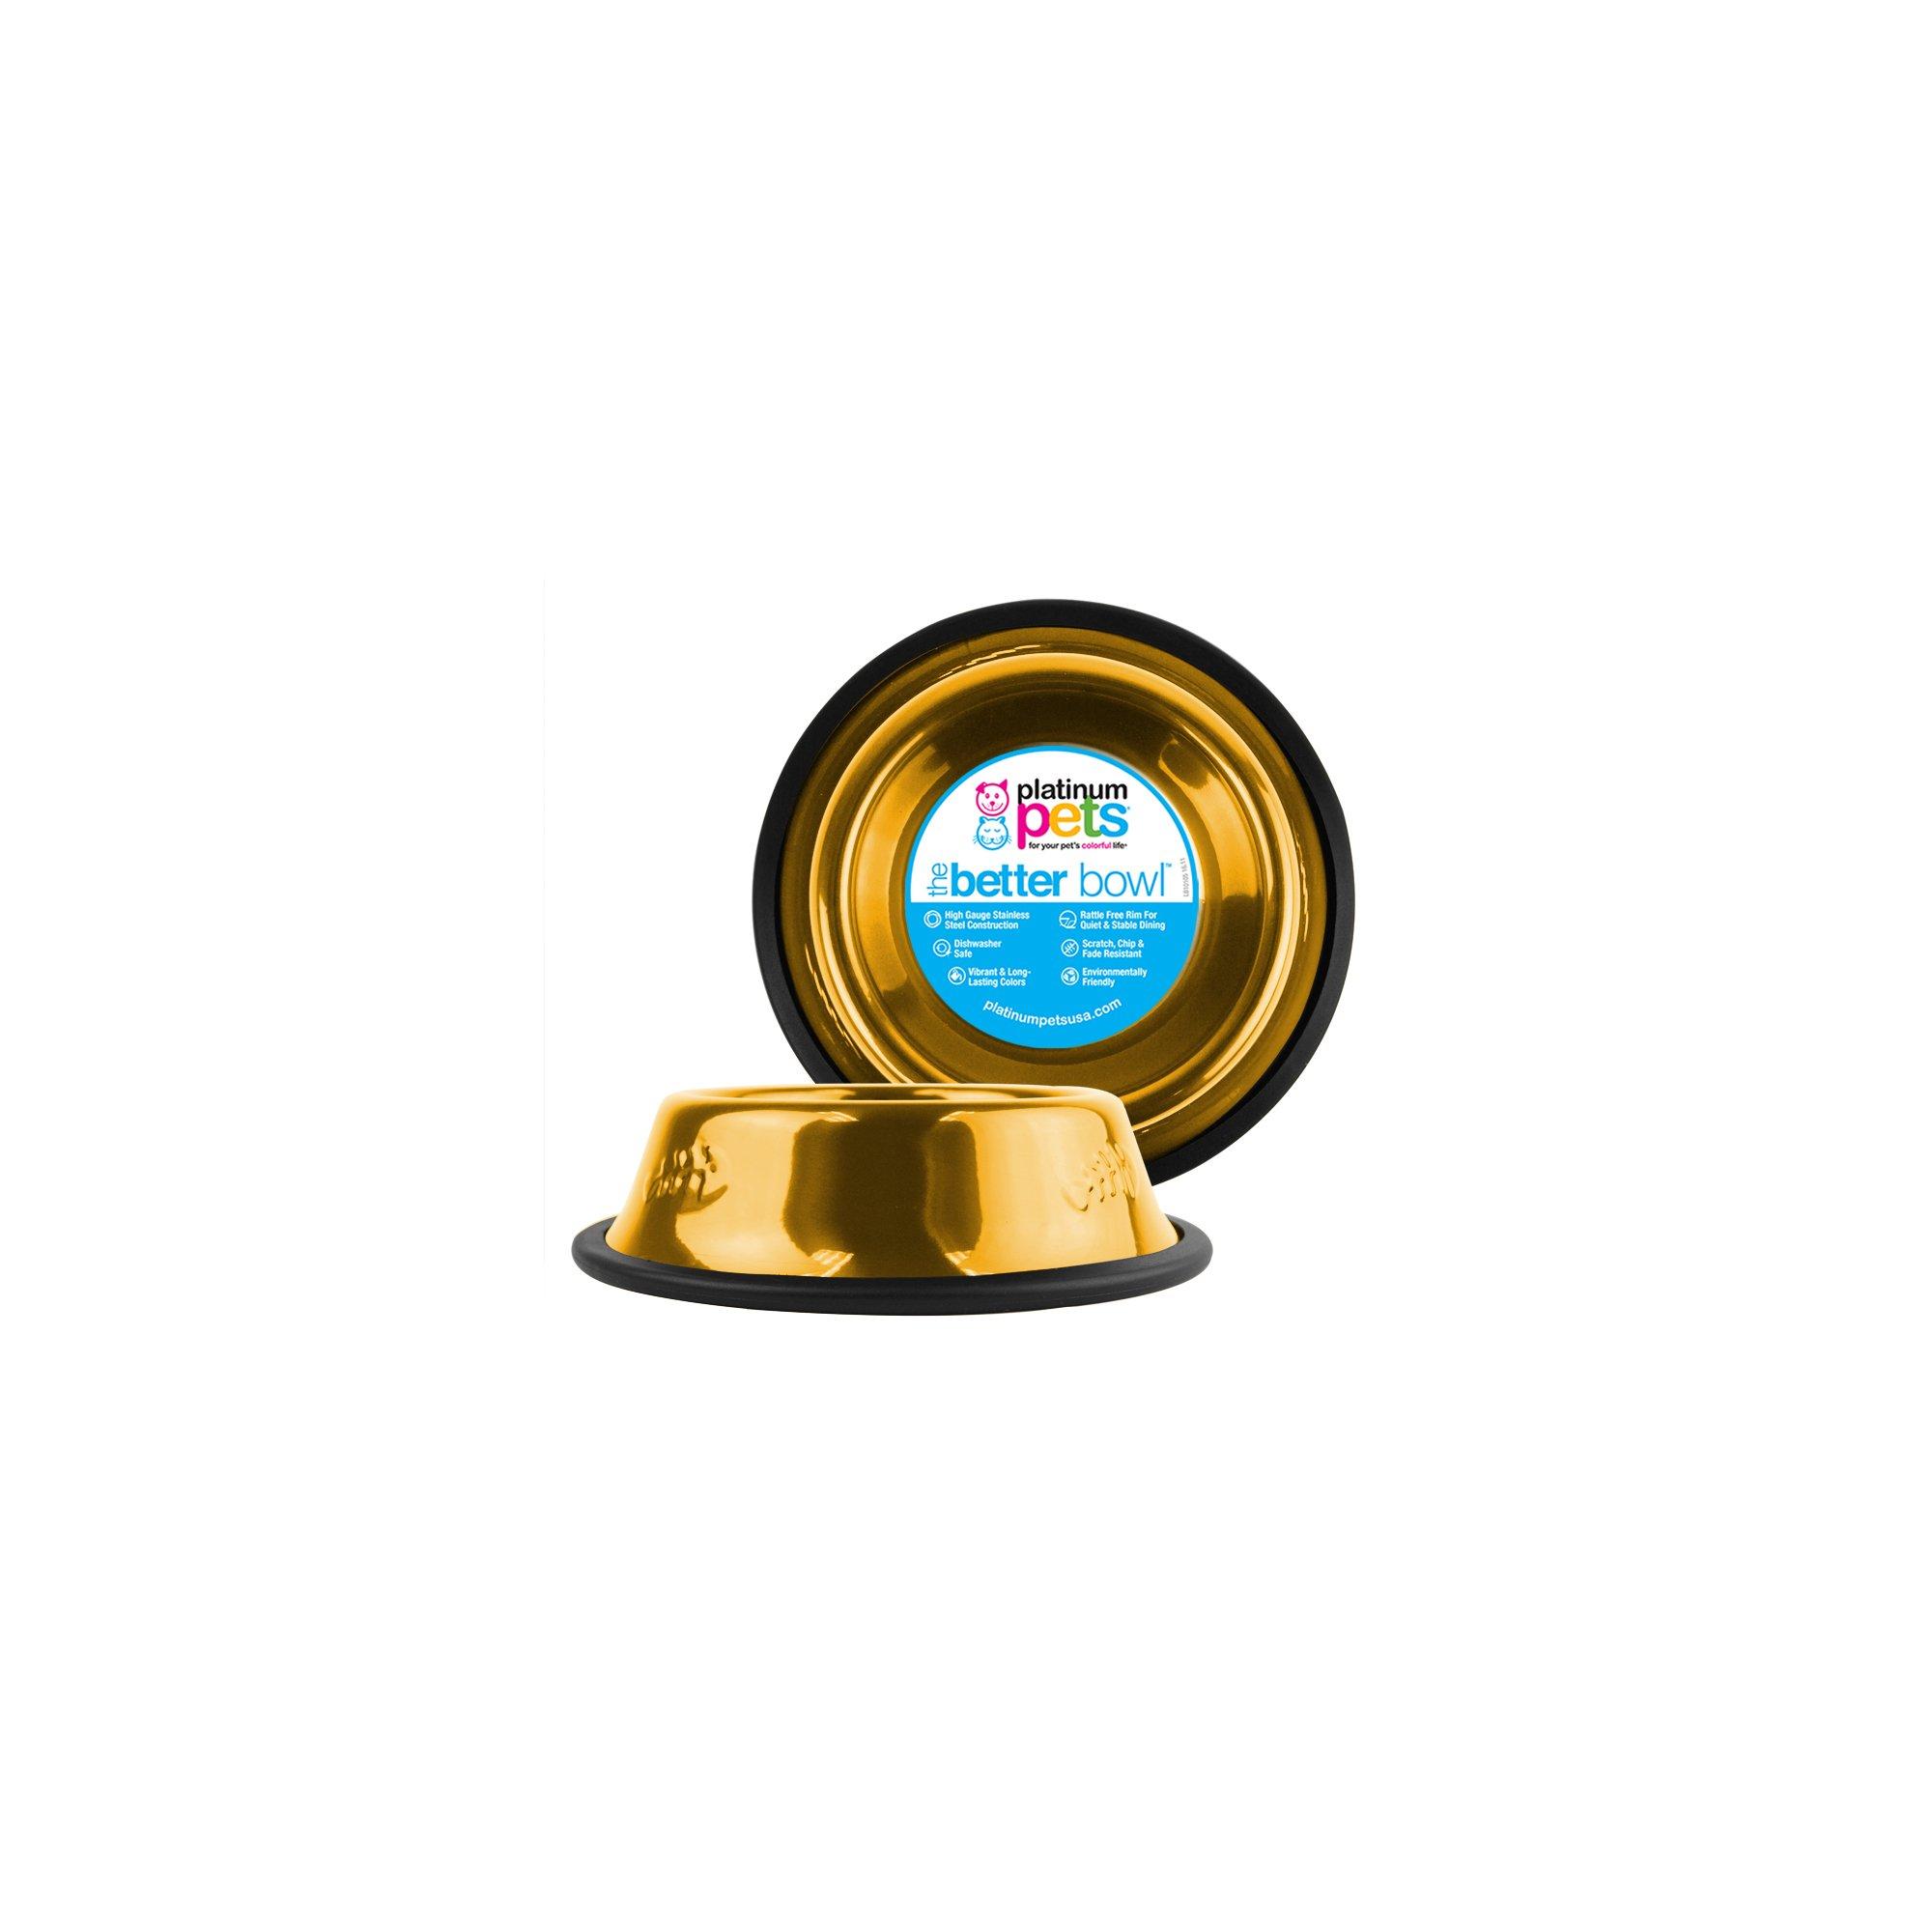 Platinum Pets Non-tip Stainless Steel Cat Bowl, 6 oz, Gold by Platinum Pets